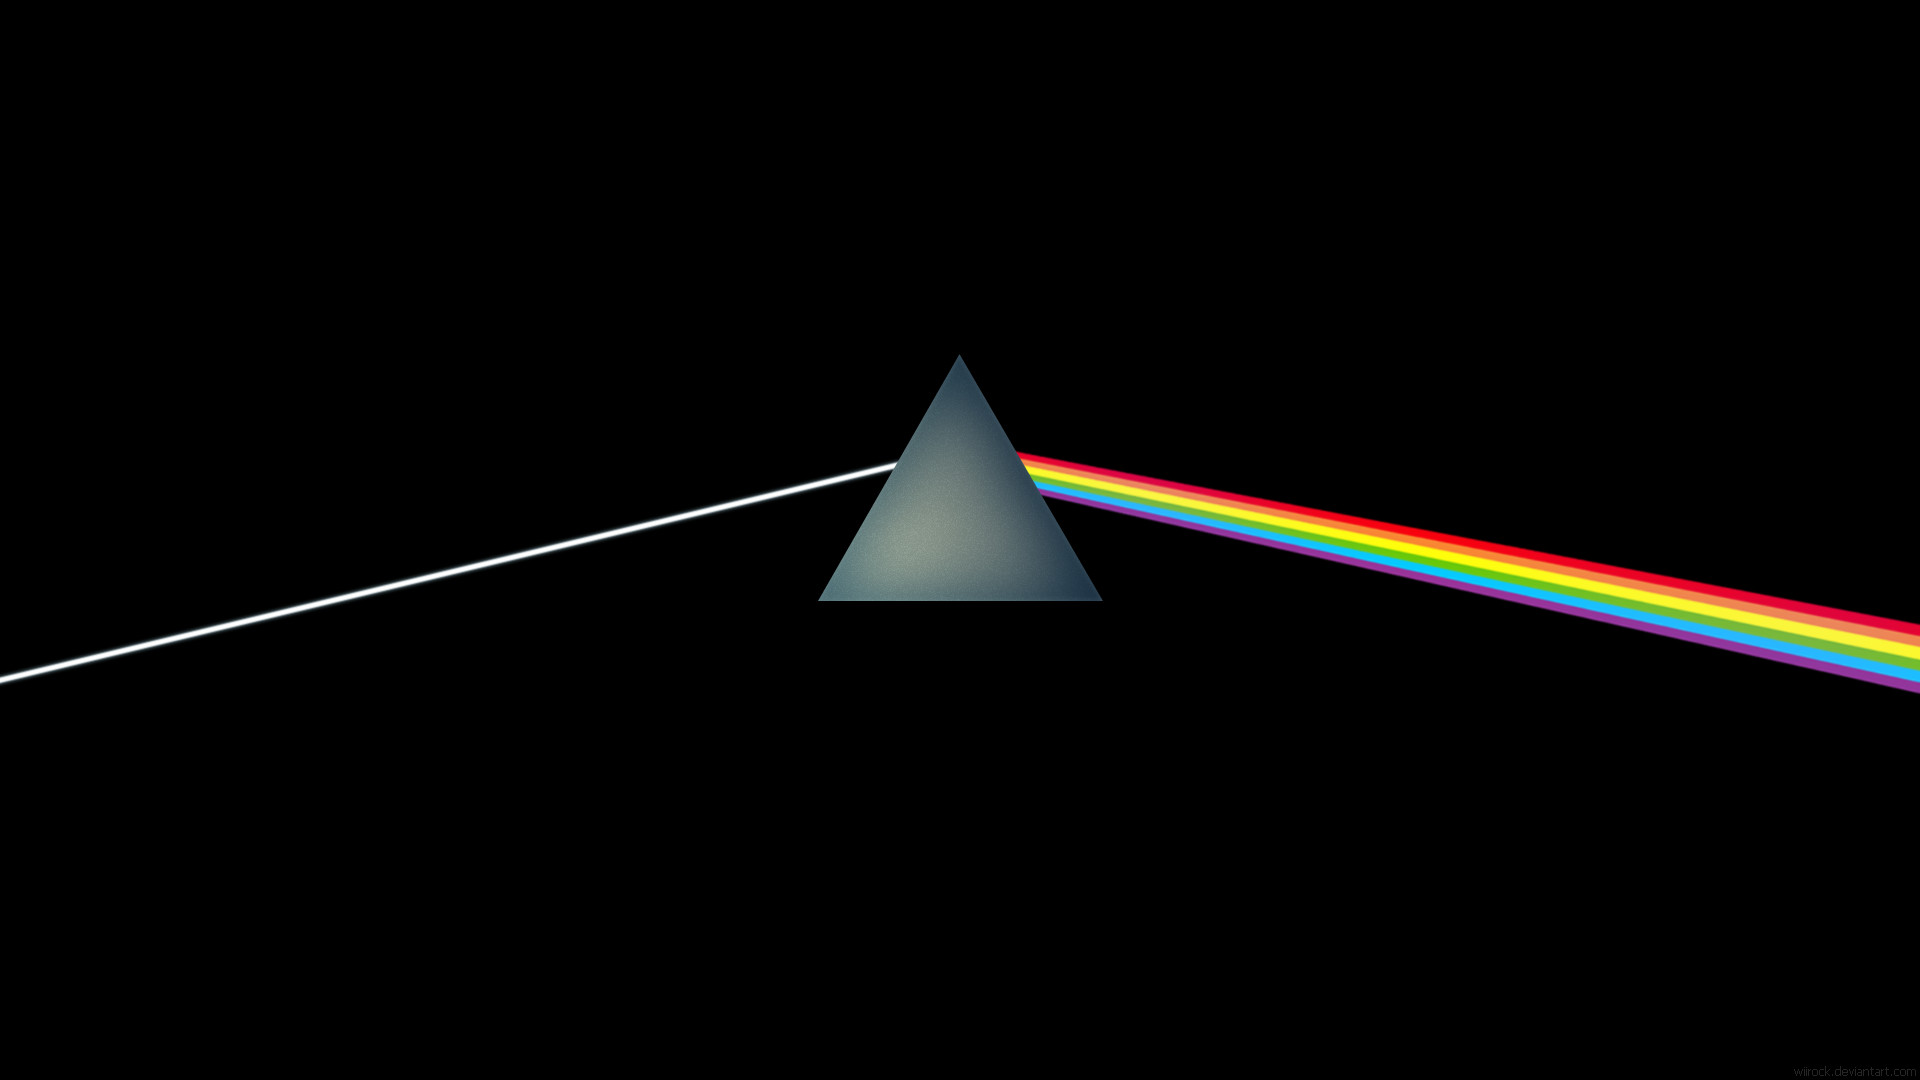 Pink Floyd Dark Side of Cookie Monster Wallpapers HD / Desktop and … |  Download Wallpaper | Pinterest | Cookie monster, Monsters and Wallpaper